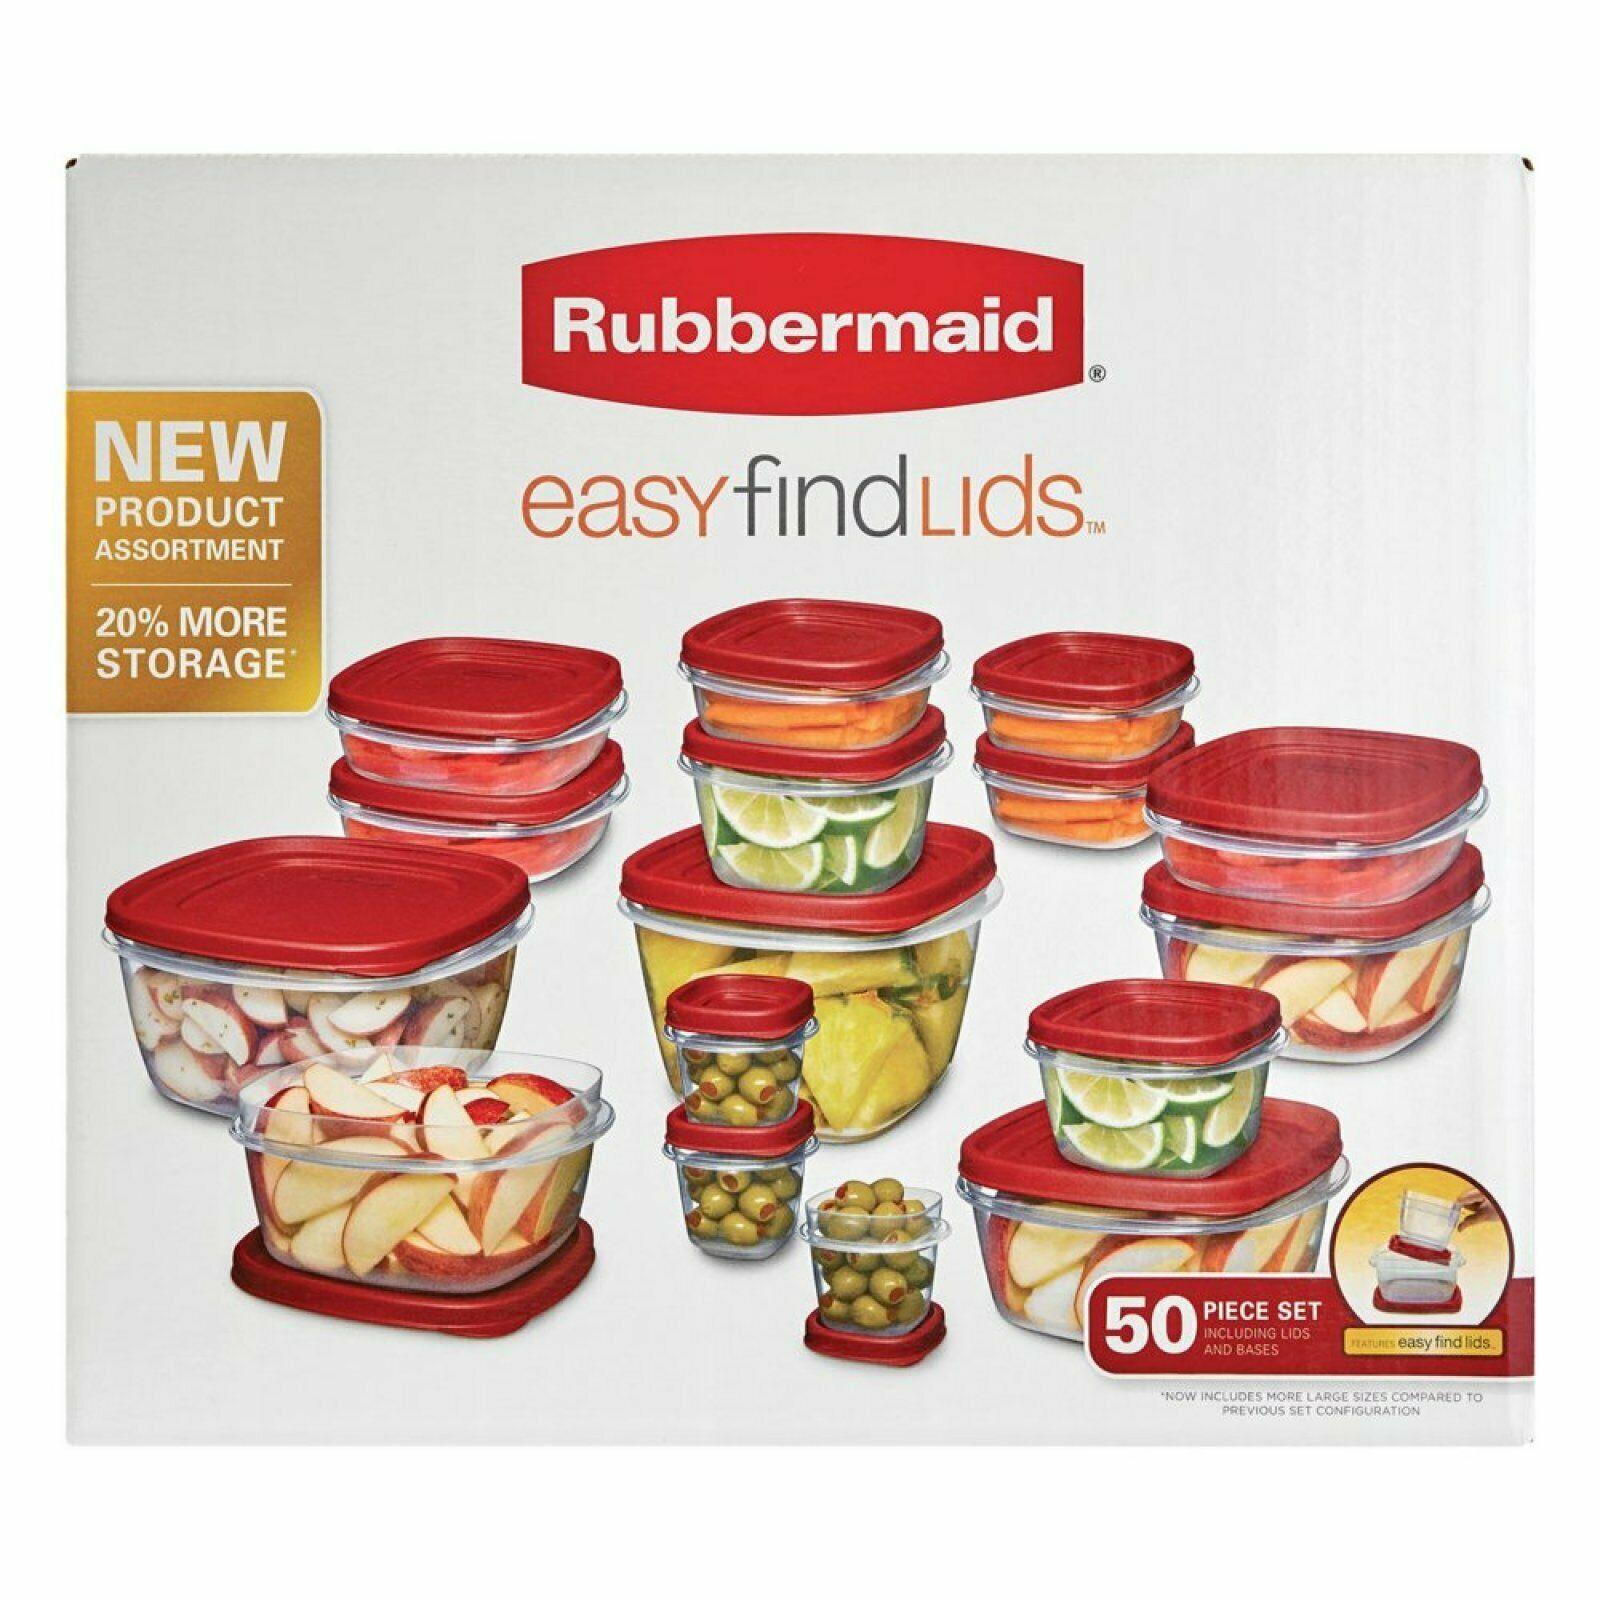 Rubbermaid 50-Piece Easy Find Lids Food Storage Kitchen Dishes Convenience Set 1